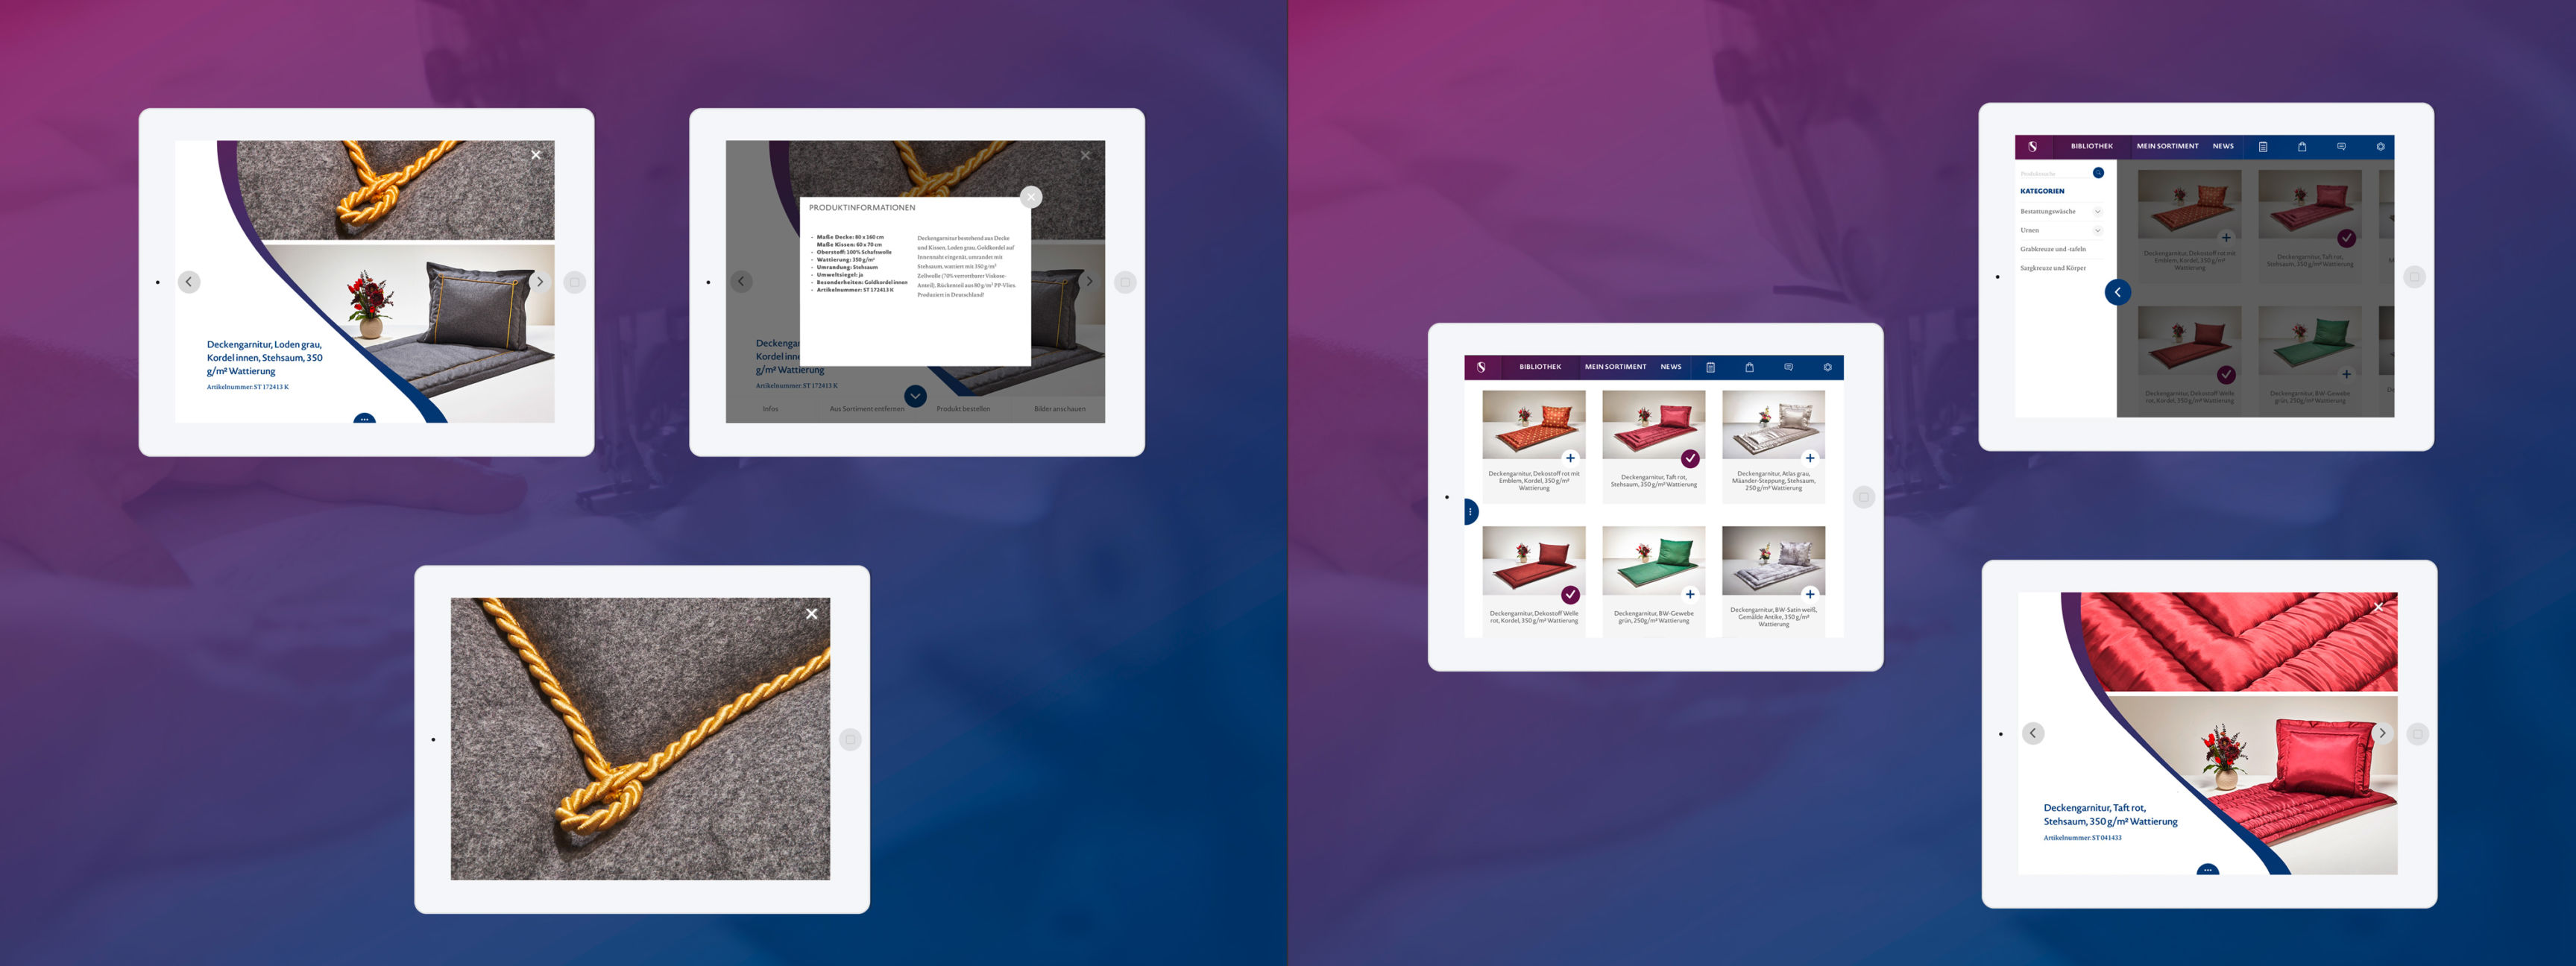 UI-Design App - Spalt Corporate Design